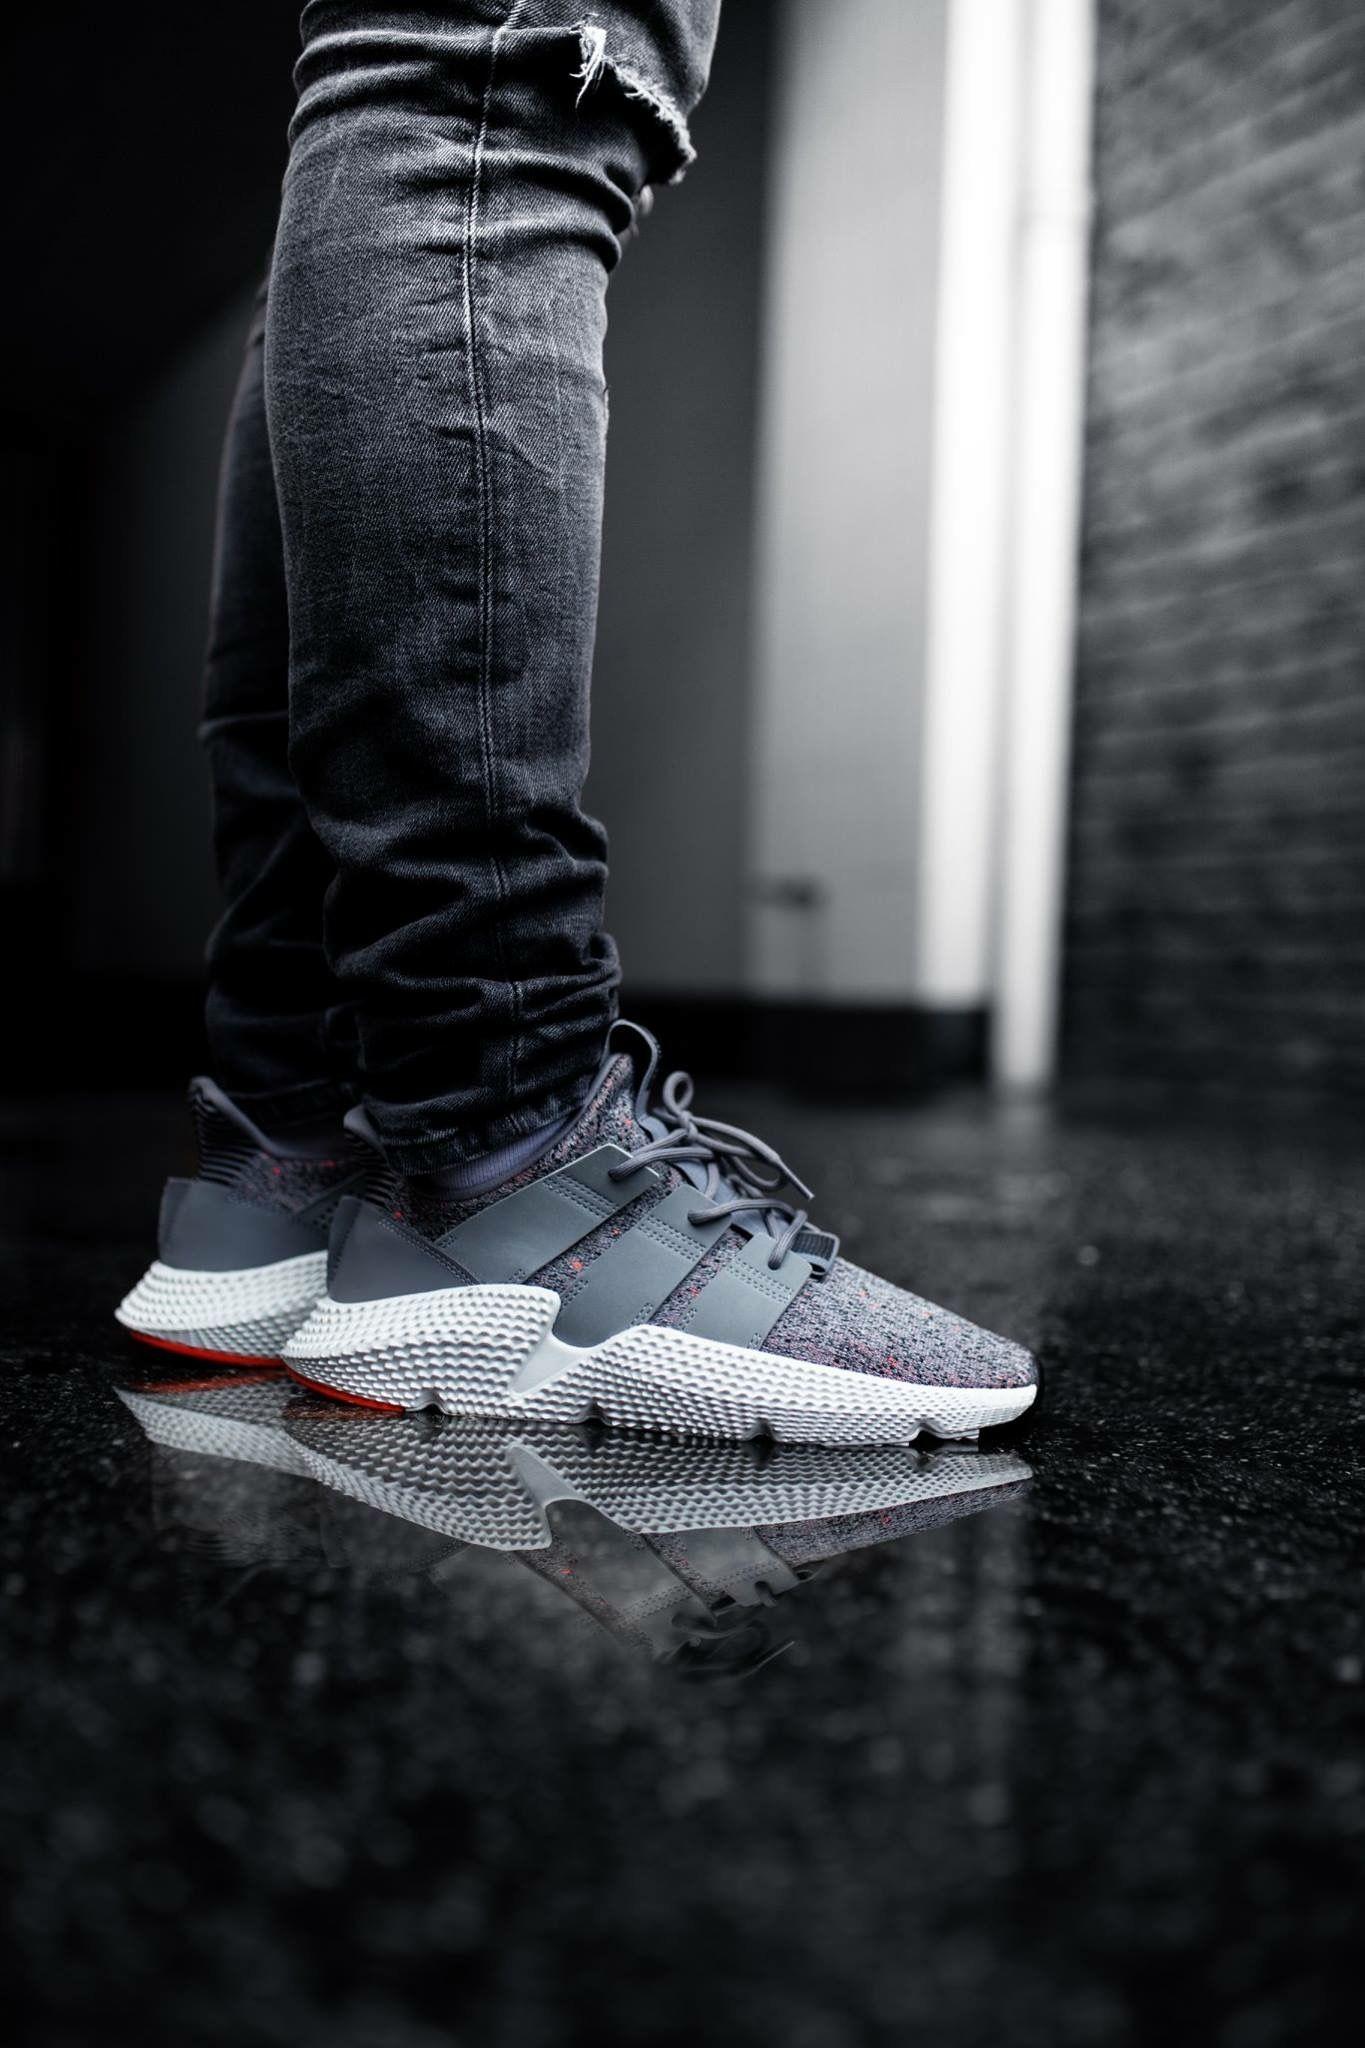 adidas originali prosphere / zmd wd2qefpfj intelligente